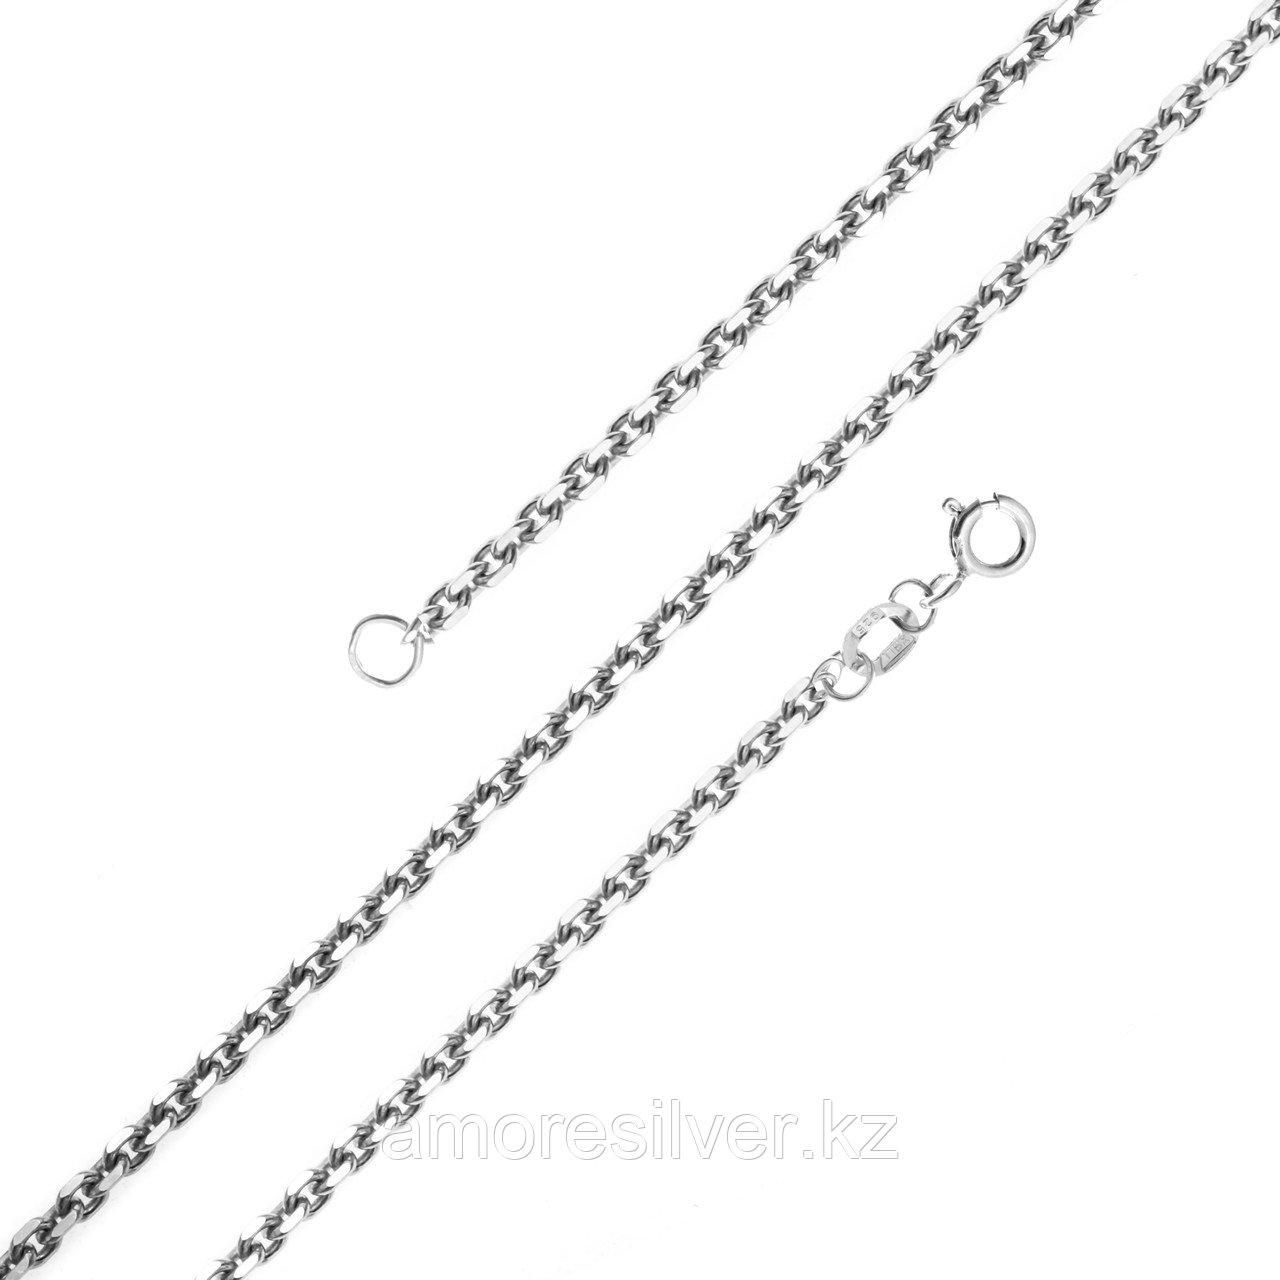 Цепь Красцветмет серебро с родием, без вставок, якорная НЦ 22-053-3-035 размеры - 50